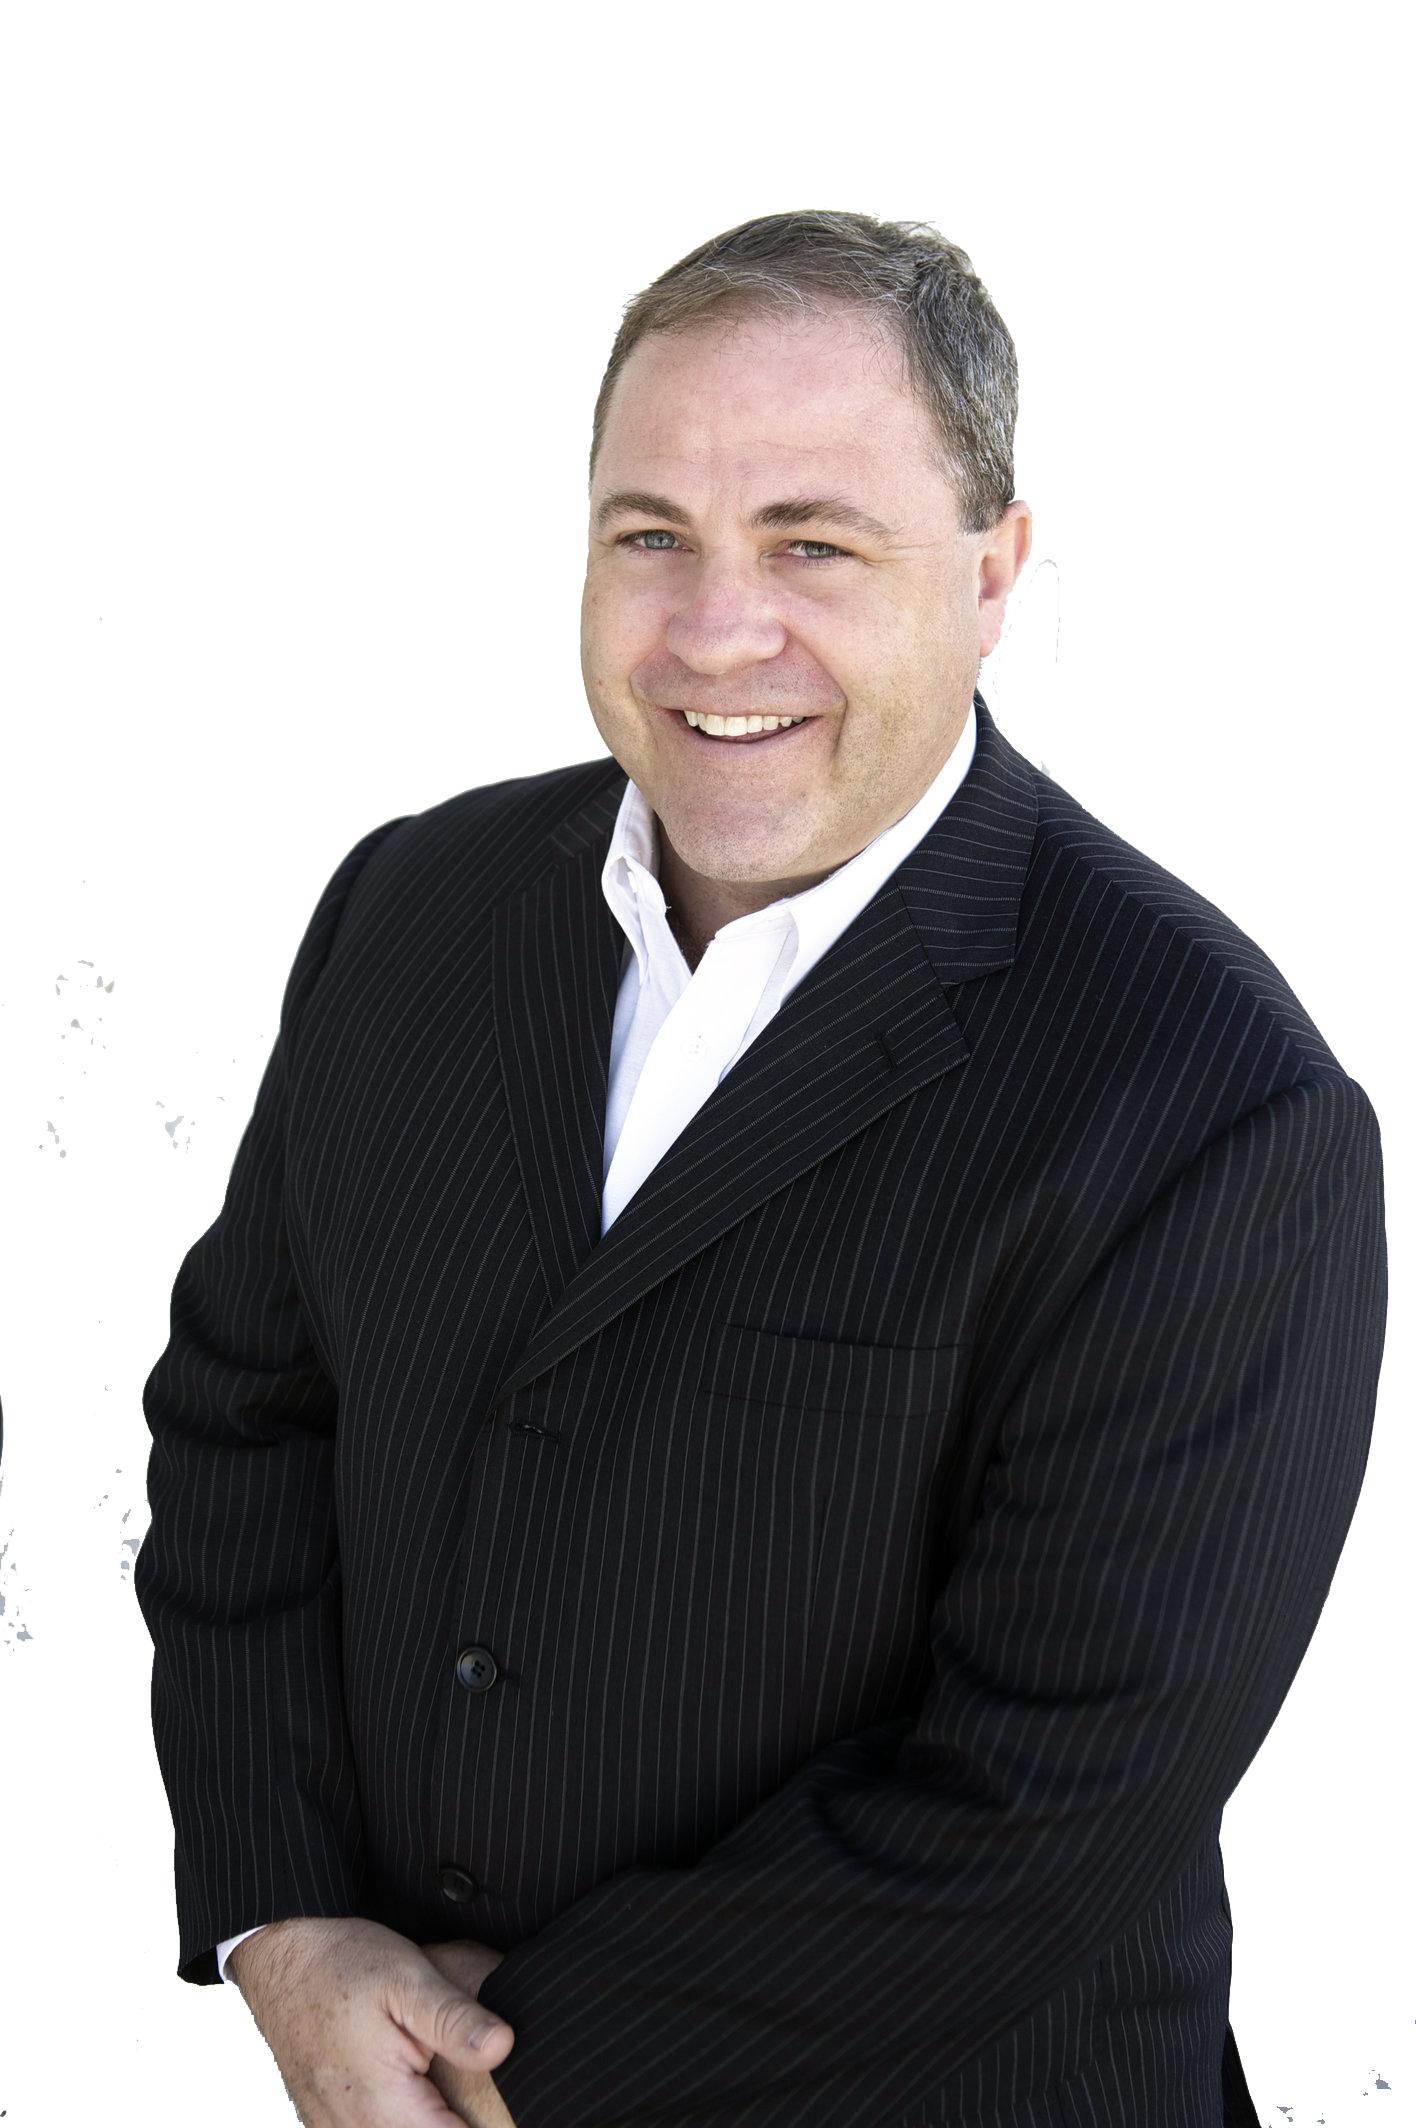 Bob O'Neill